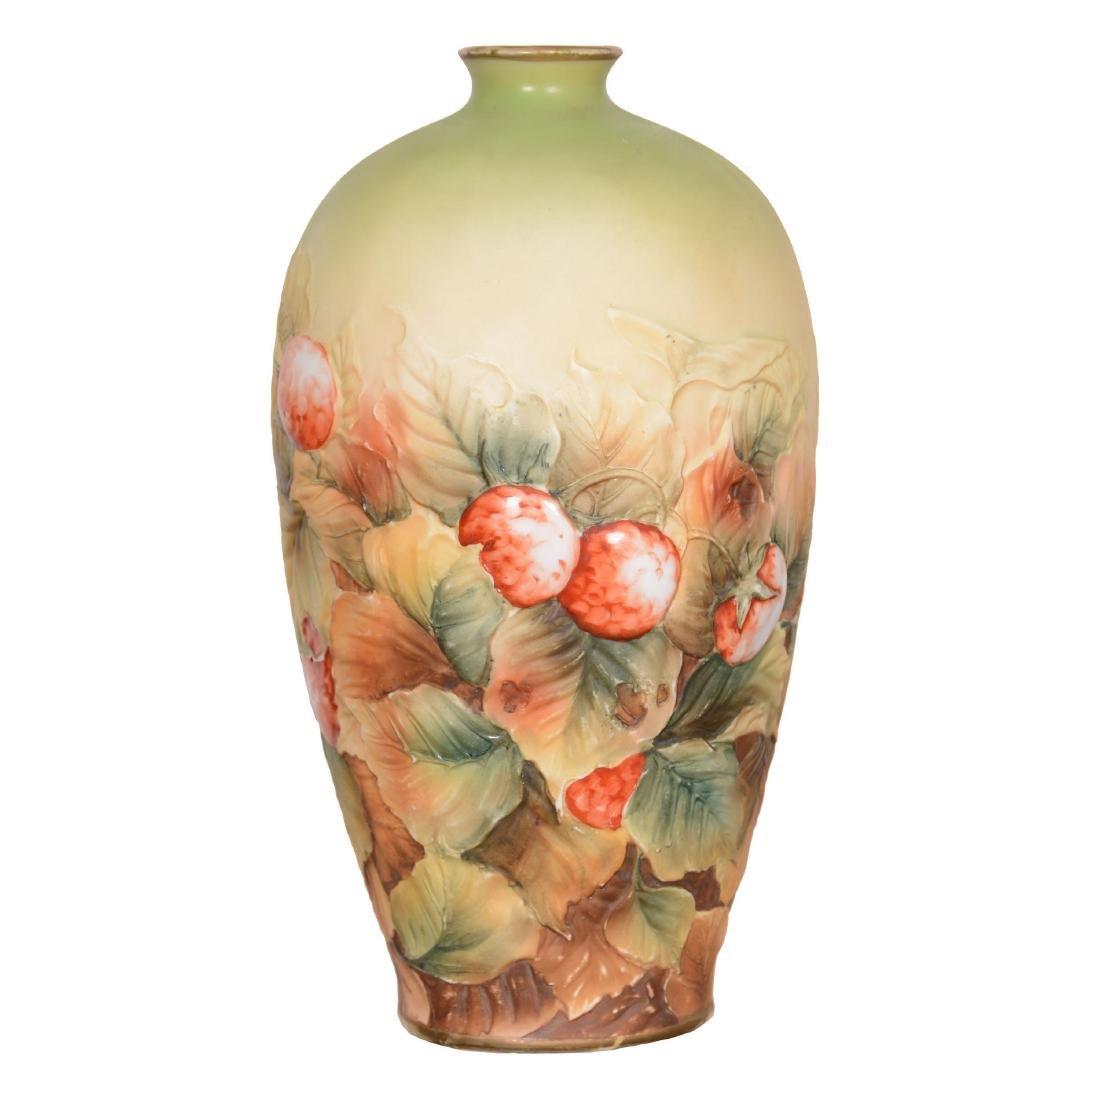 Nippon Blown Mold Vase